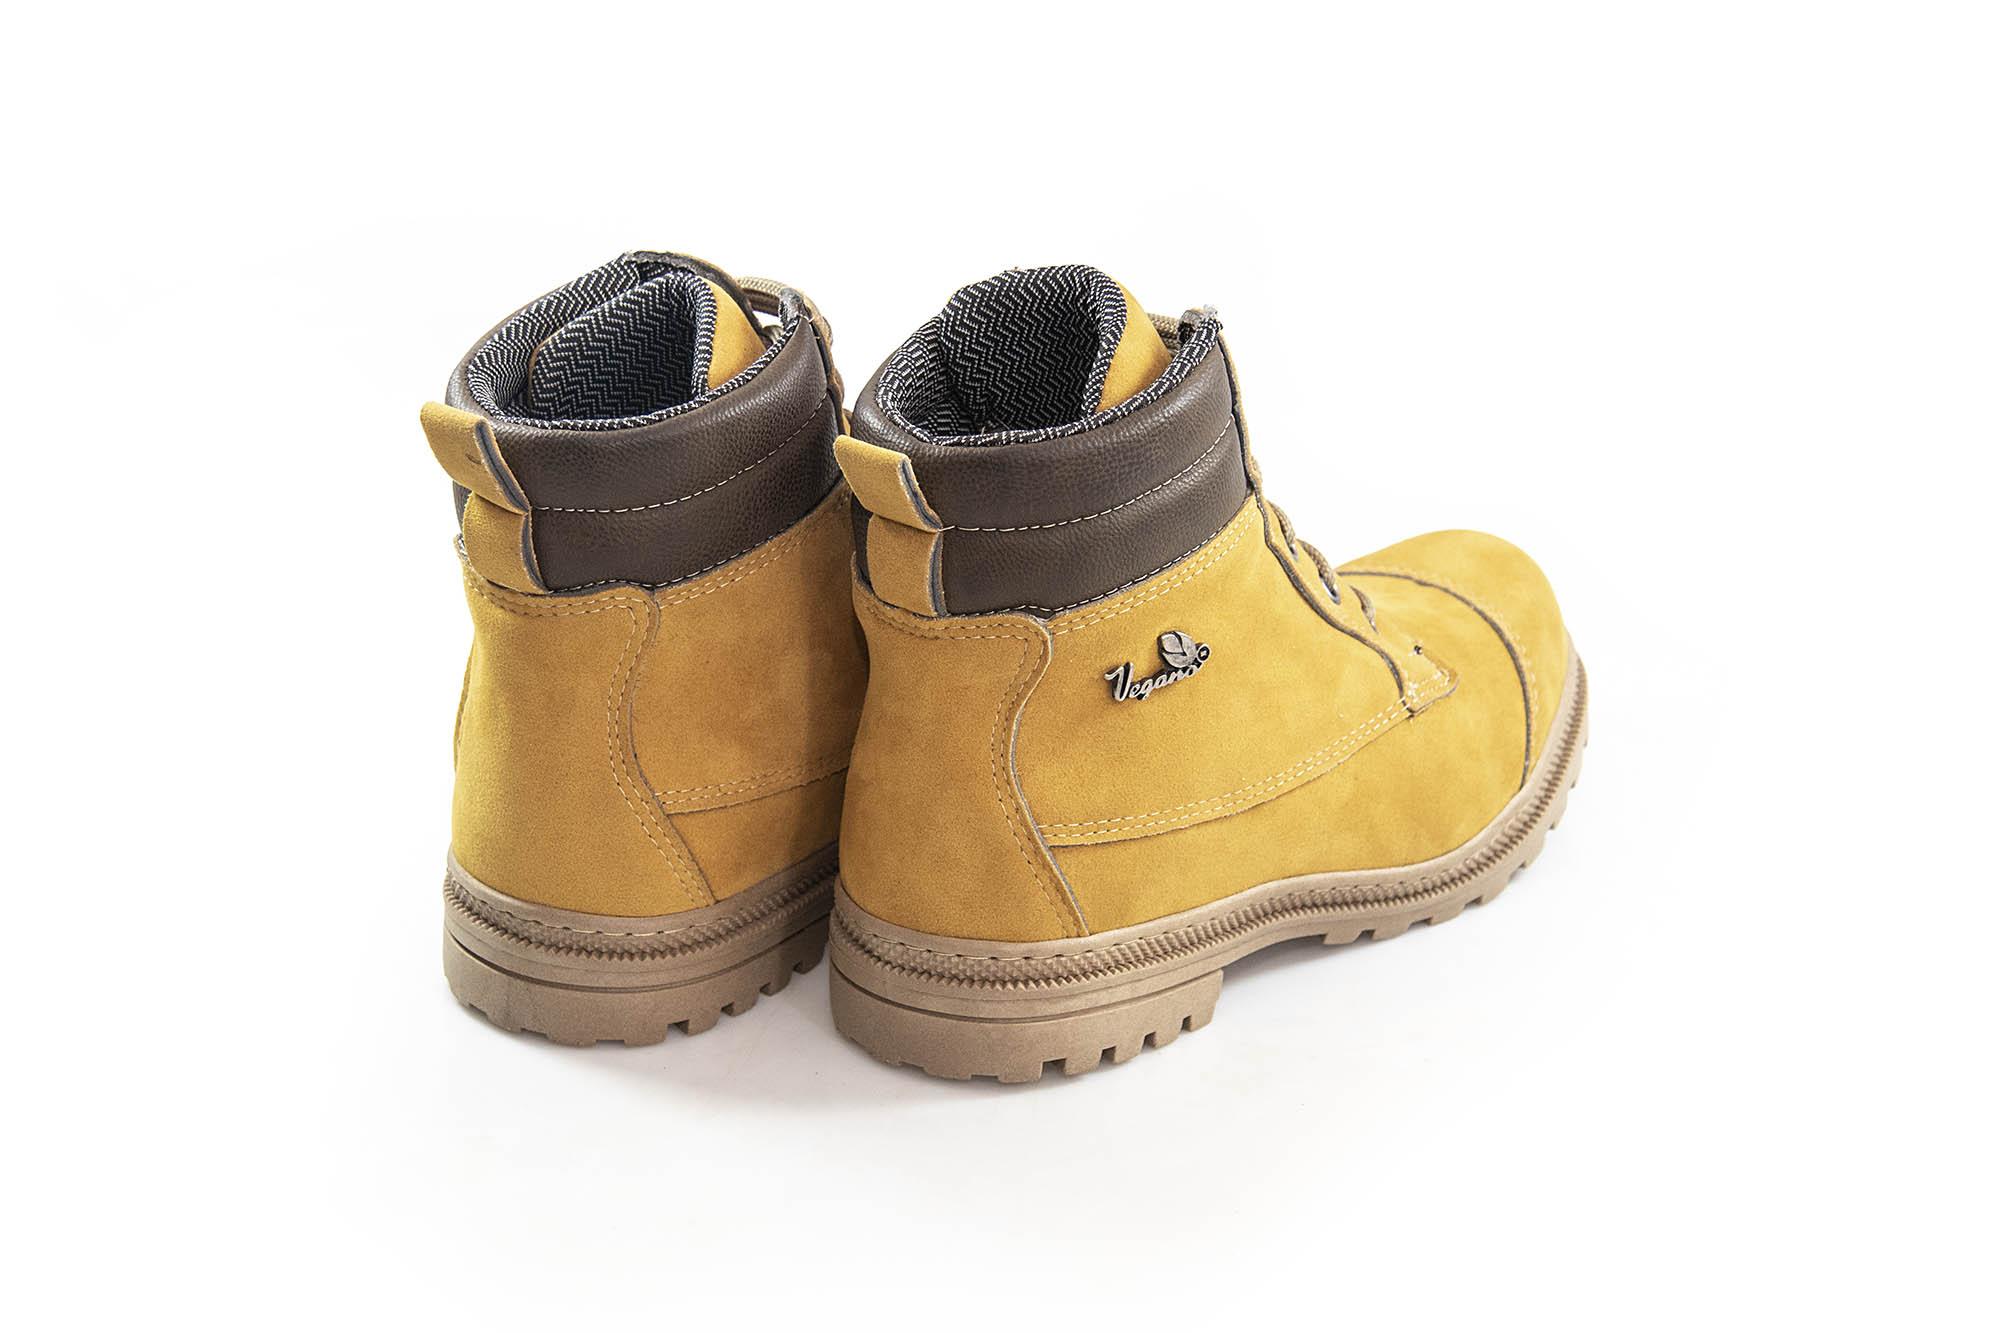 Bota Vegano Shoes Naturale Soft Amarelo (Yellow boot)